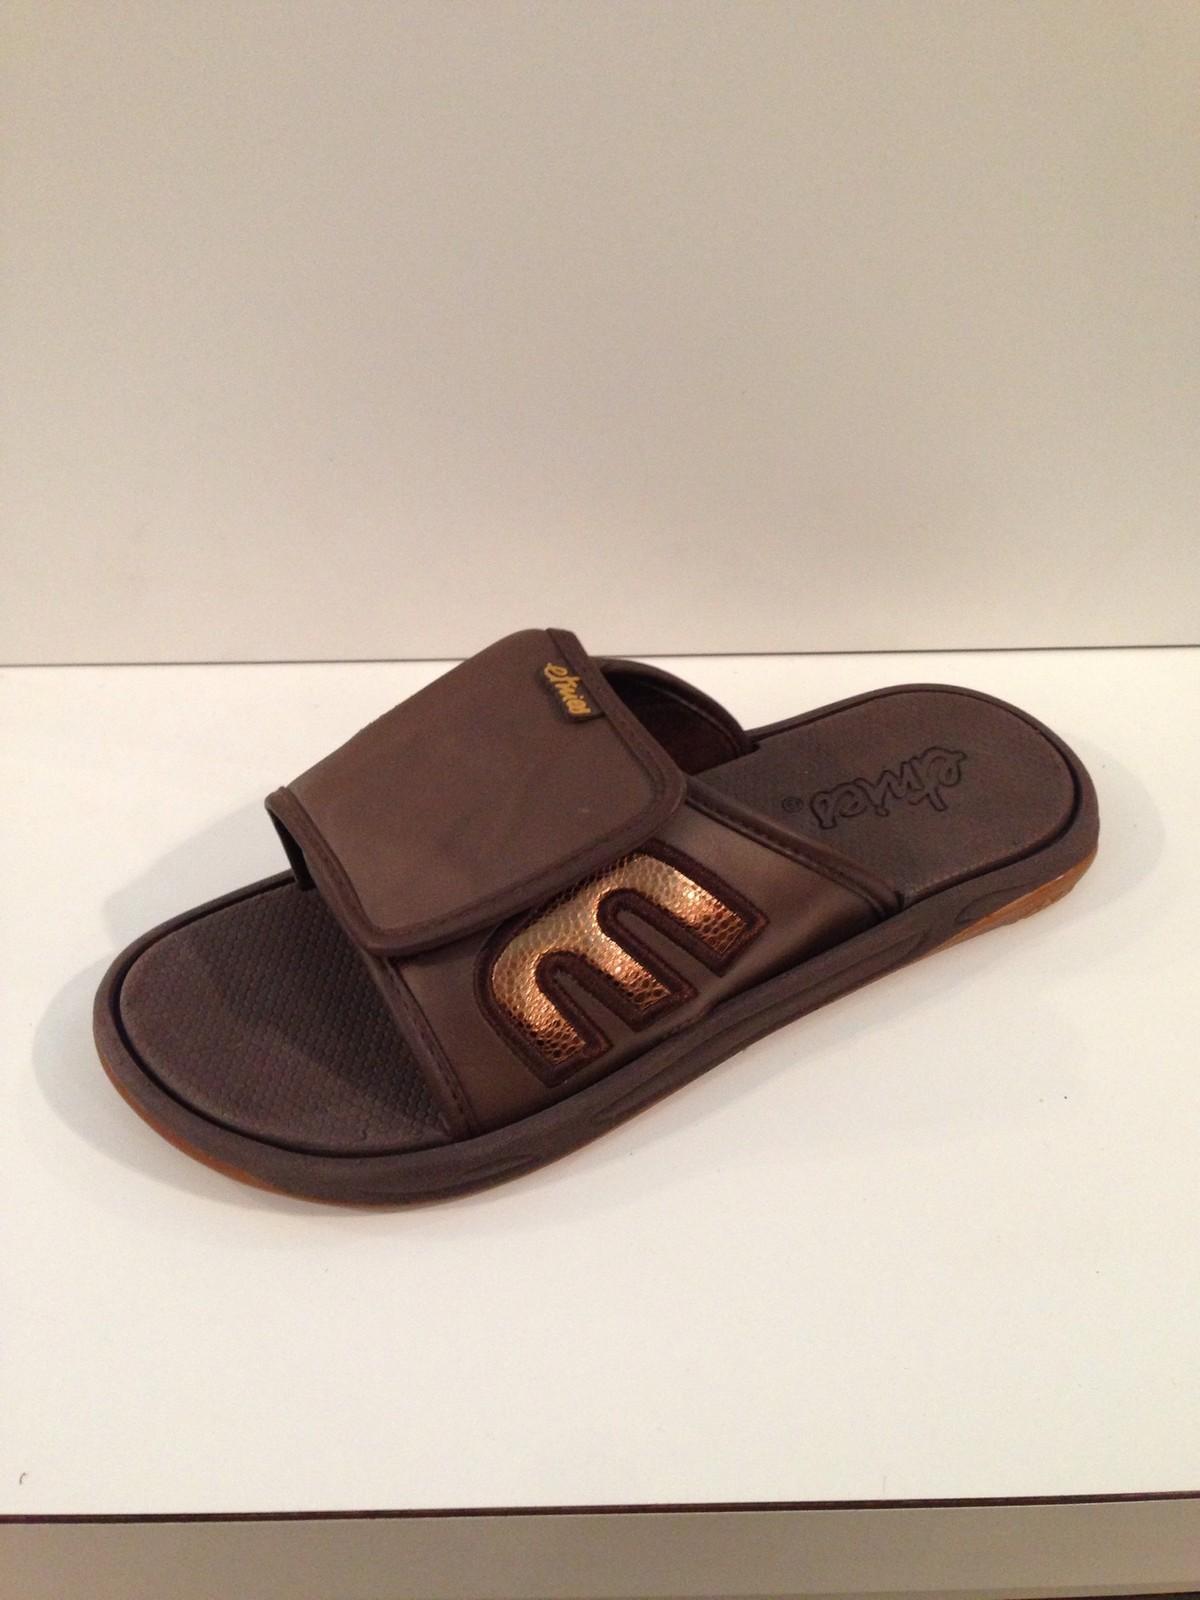 etnies sandals